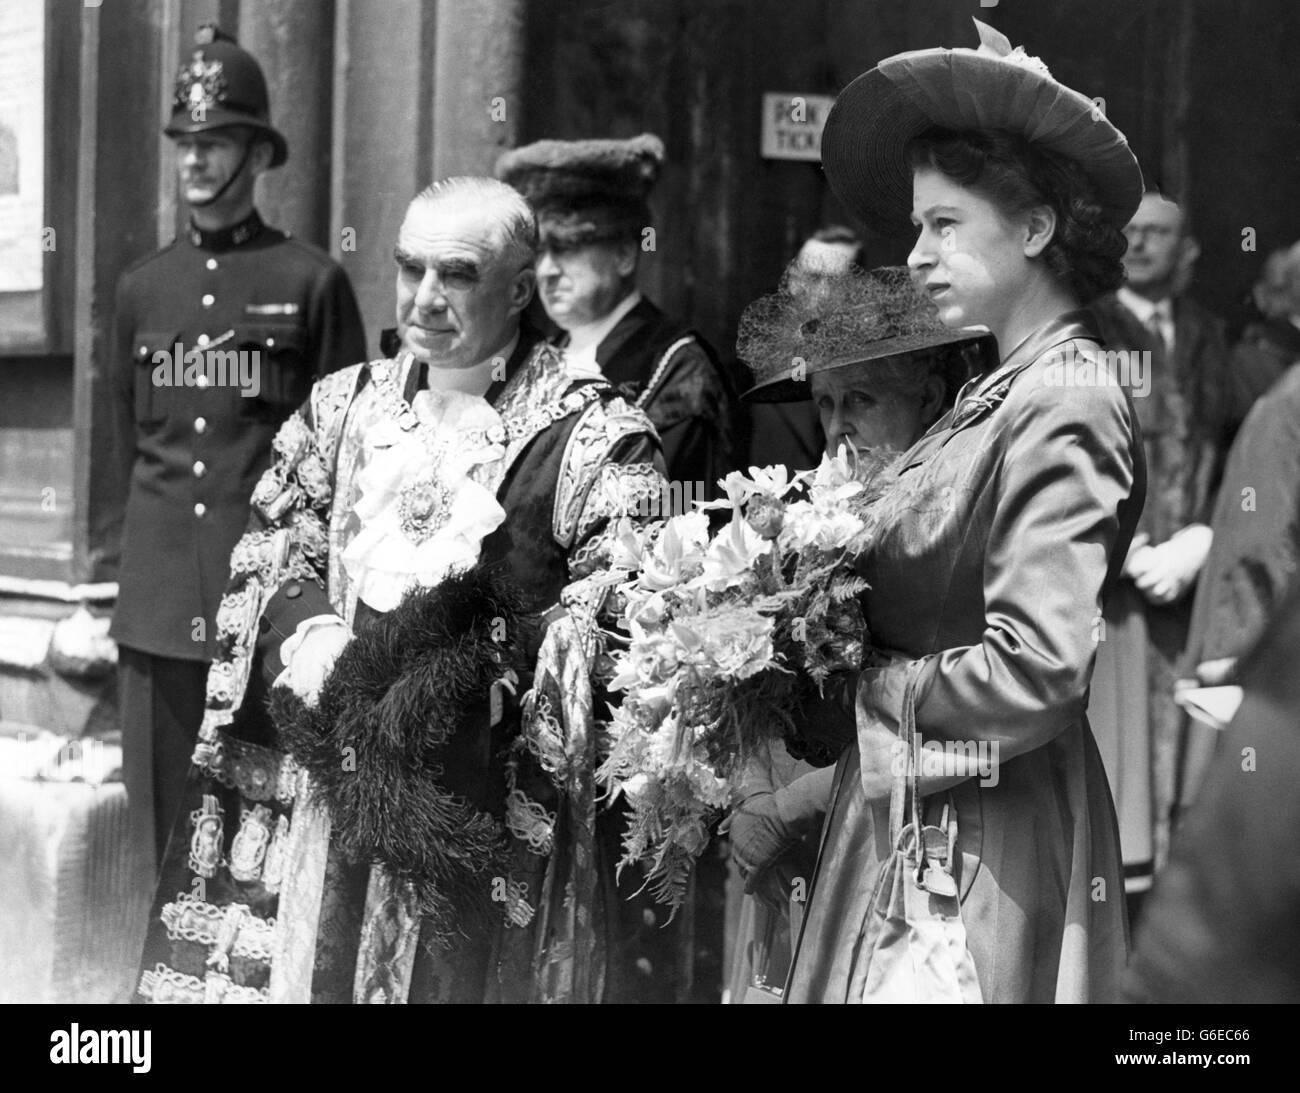 Royalty - Princess Elizabeth - Freedom of the City of London - Stock Image